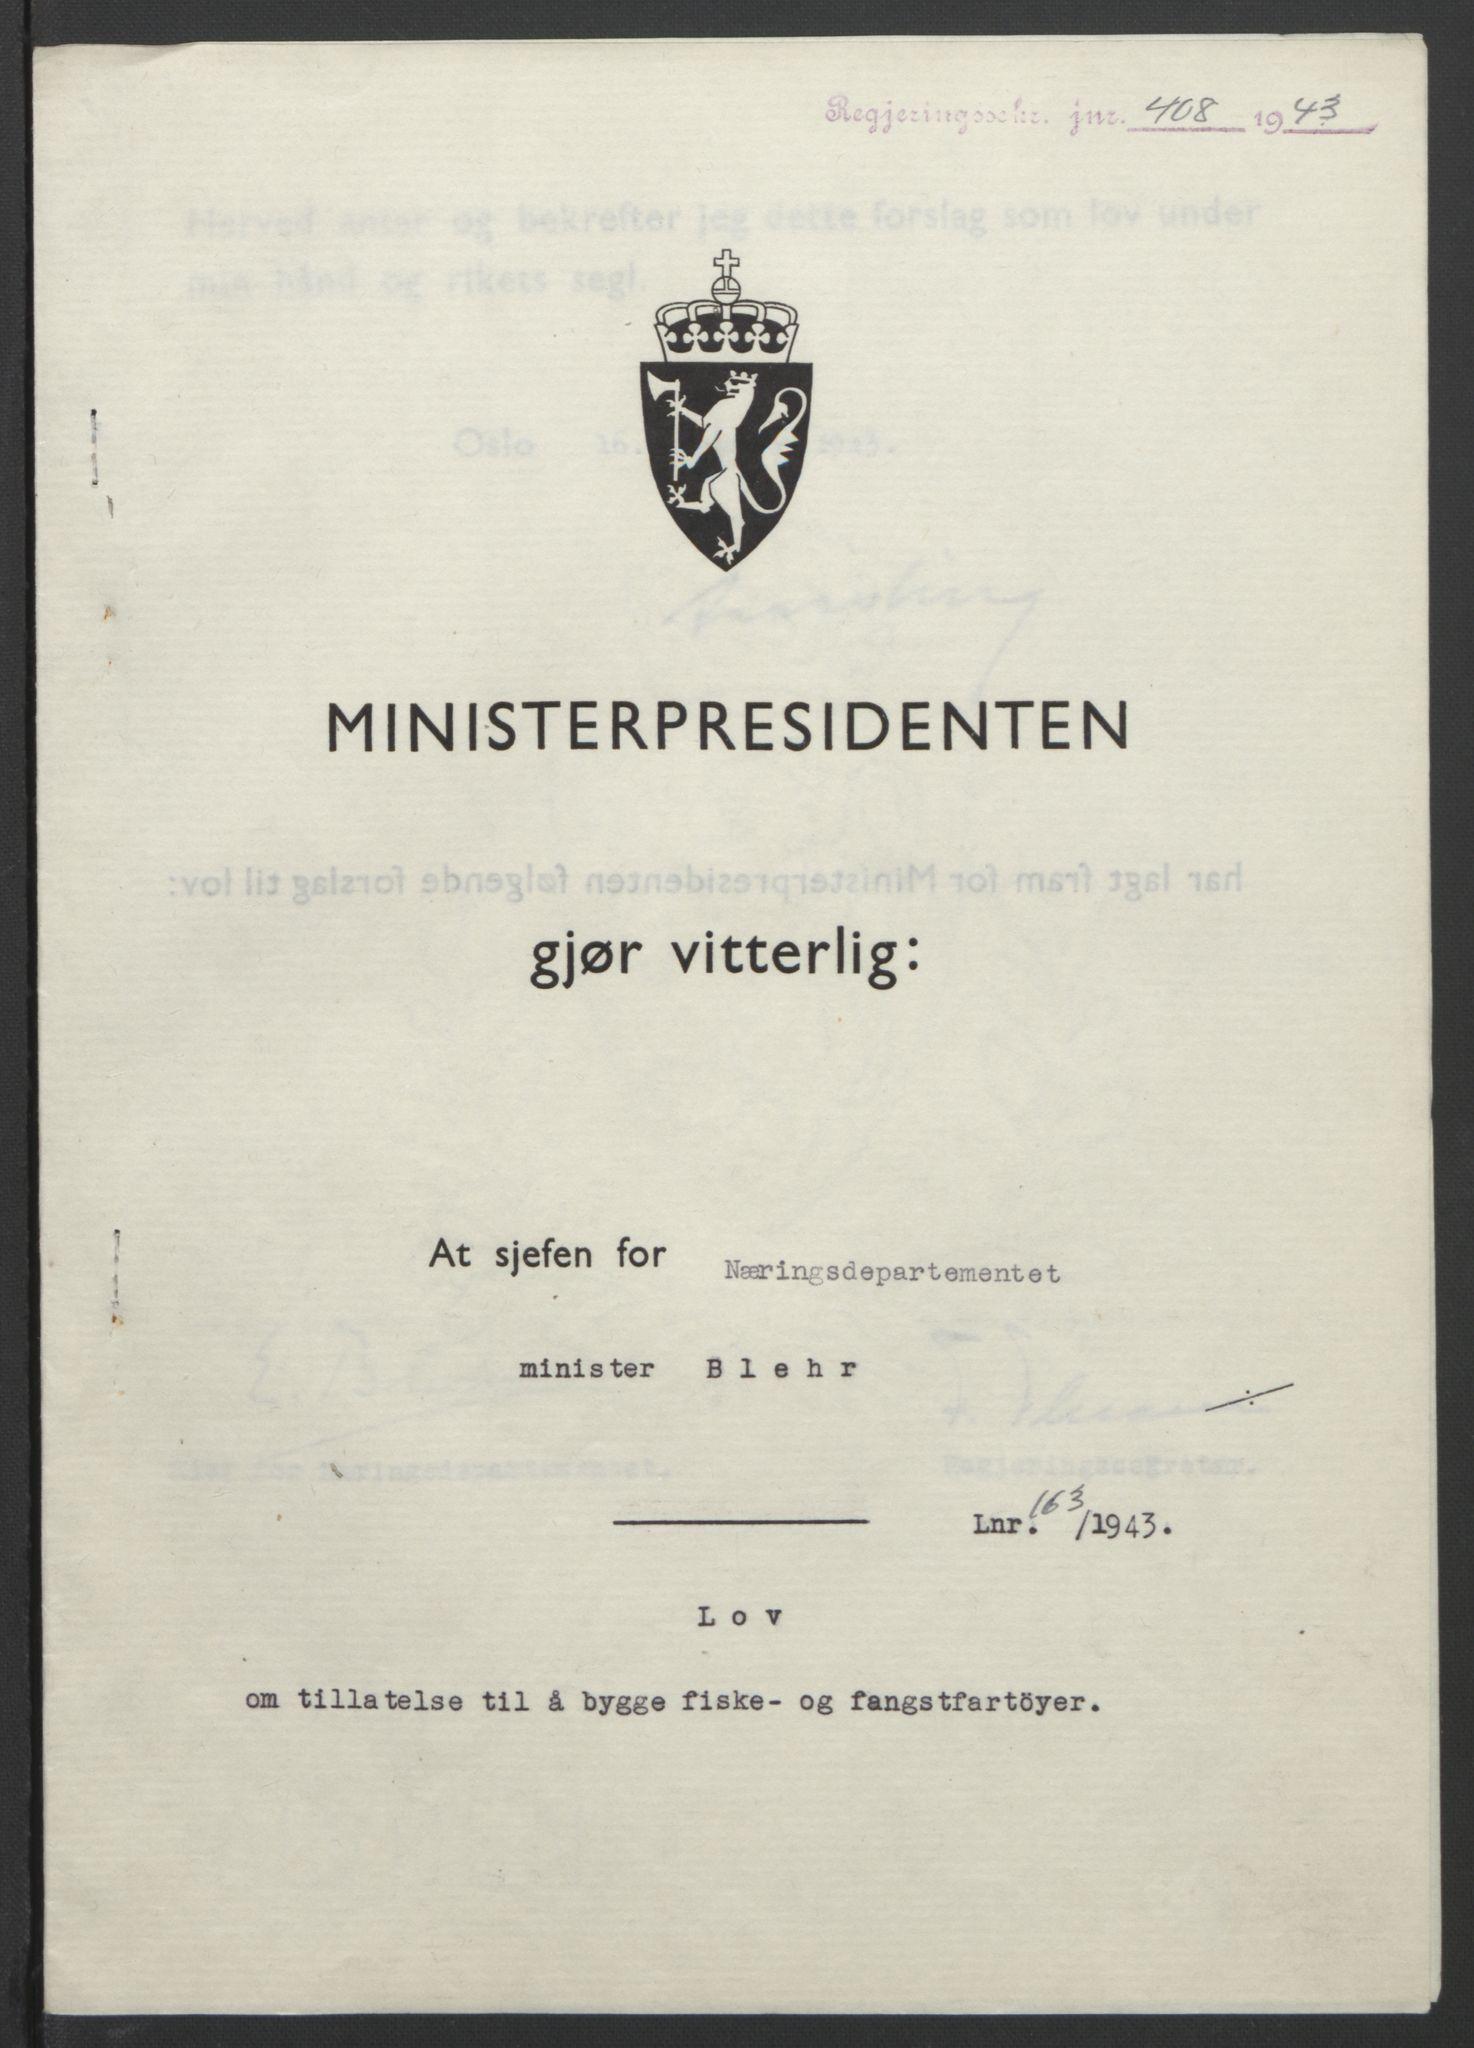 RA, NS-administrasjonen 1940-1945 (Statsrådsekretariatet, de kommisariske statsråder mm), D/Db/L0099: Lover, 1943, s. 770